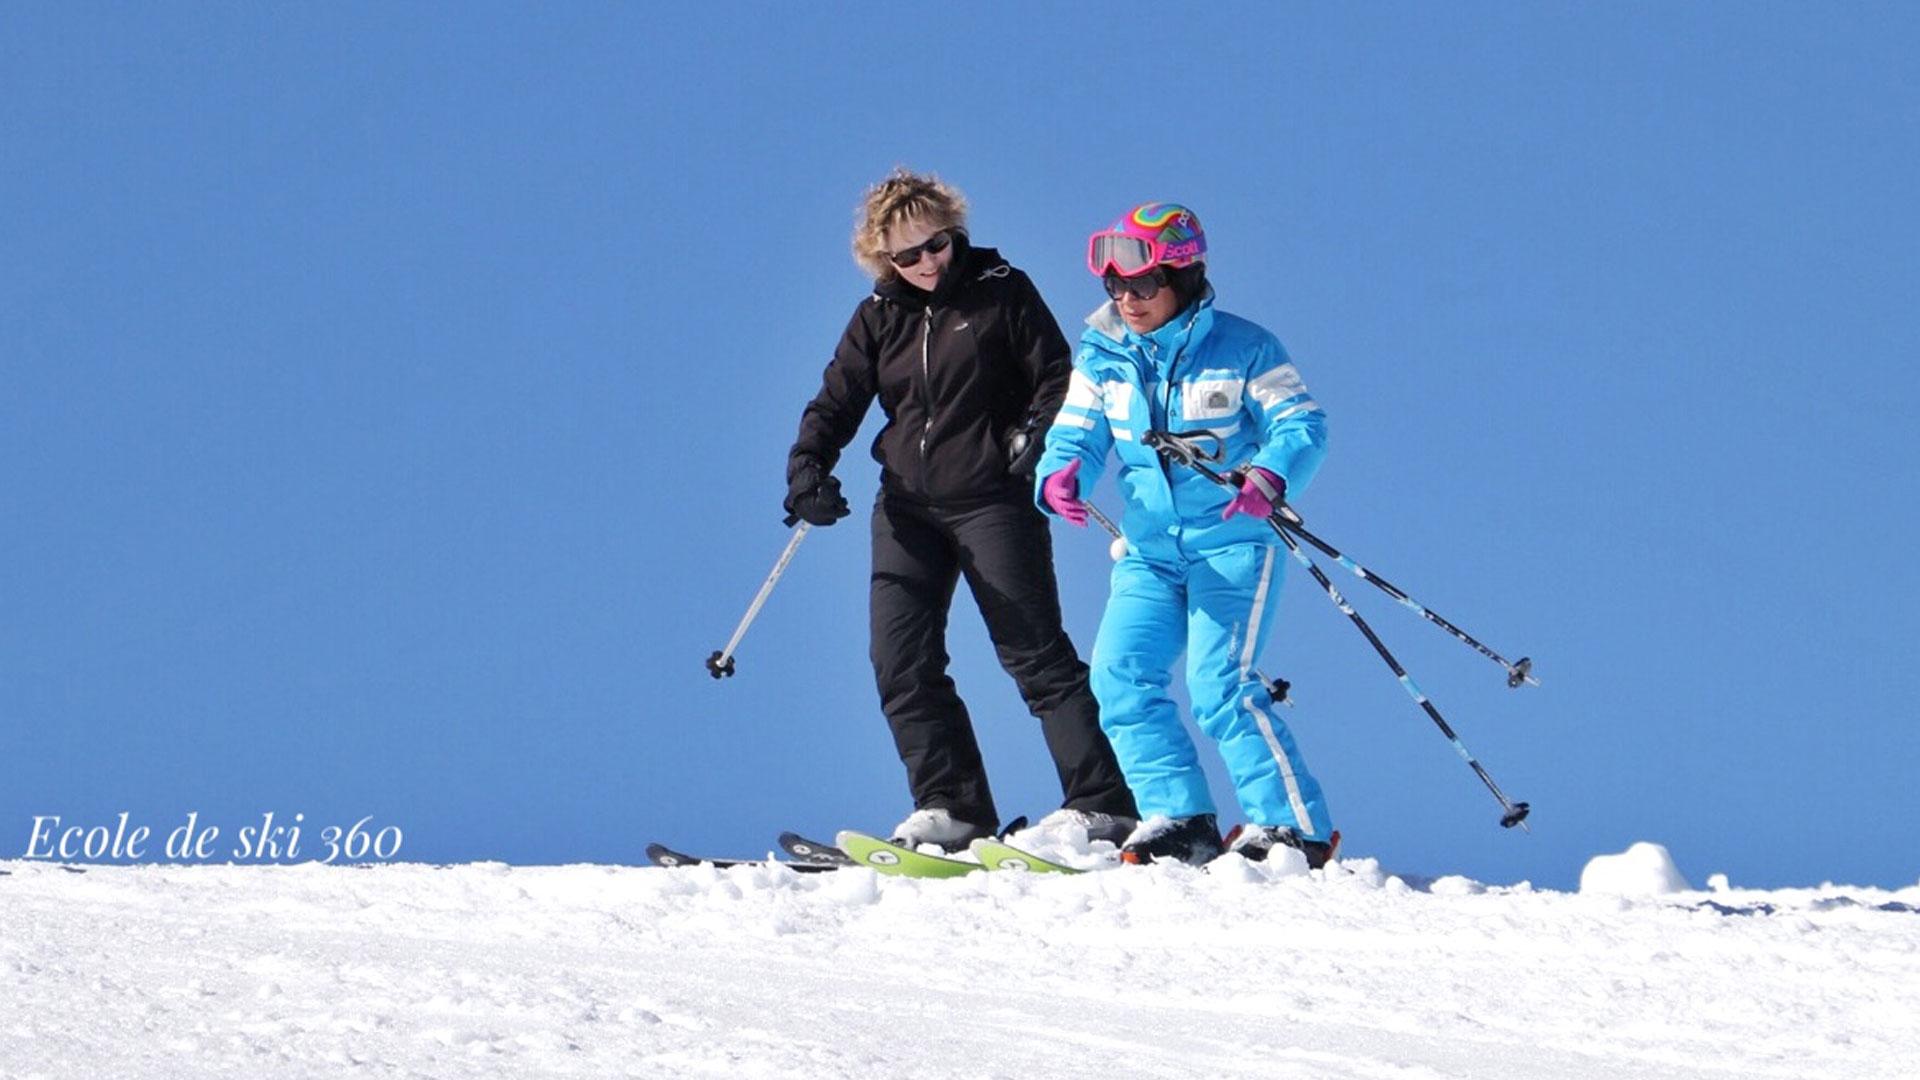 cours-ski-adultes-lecon